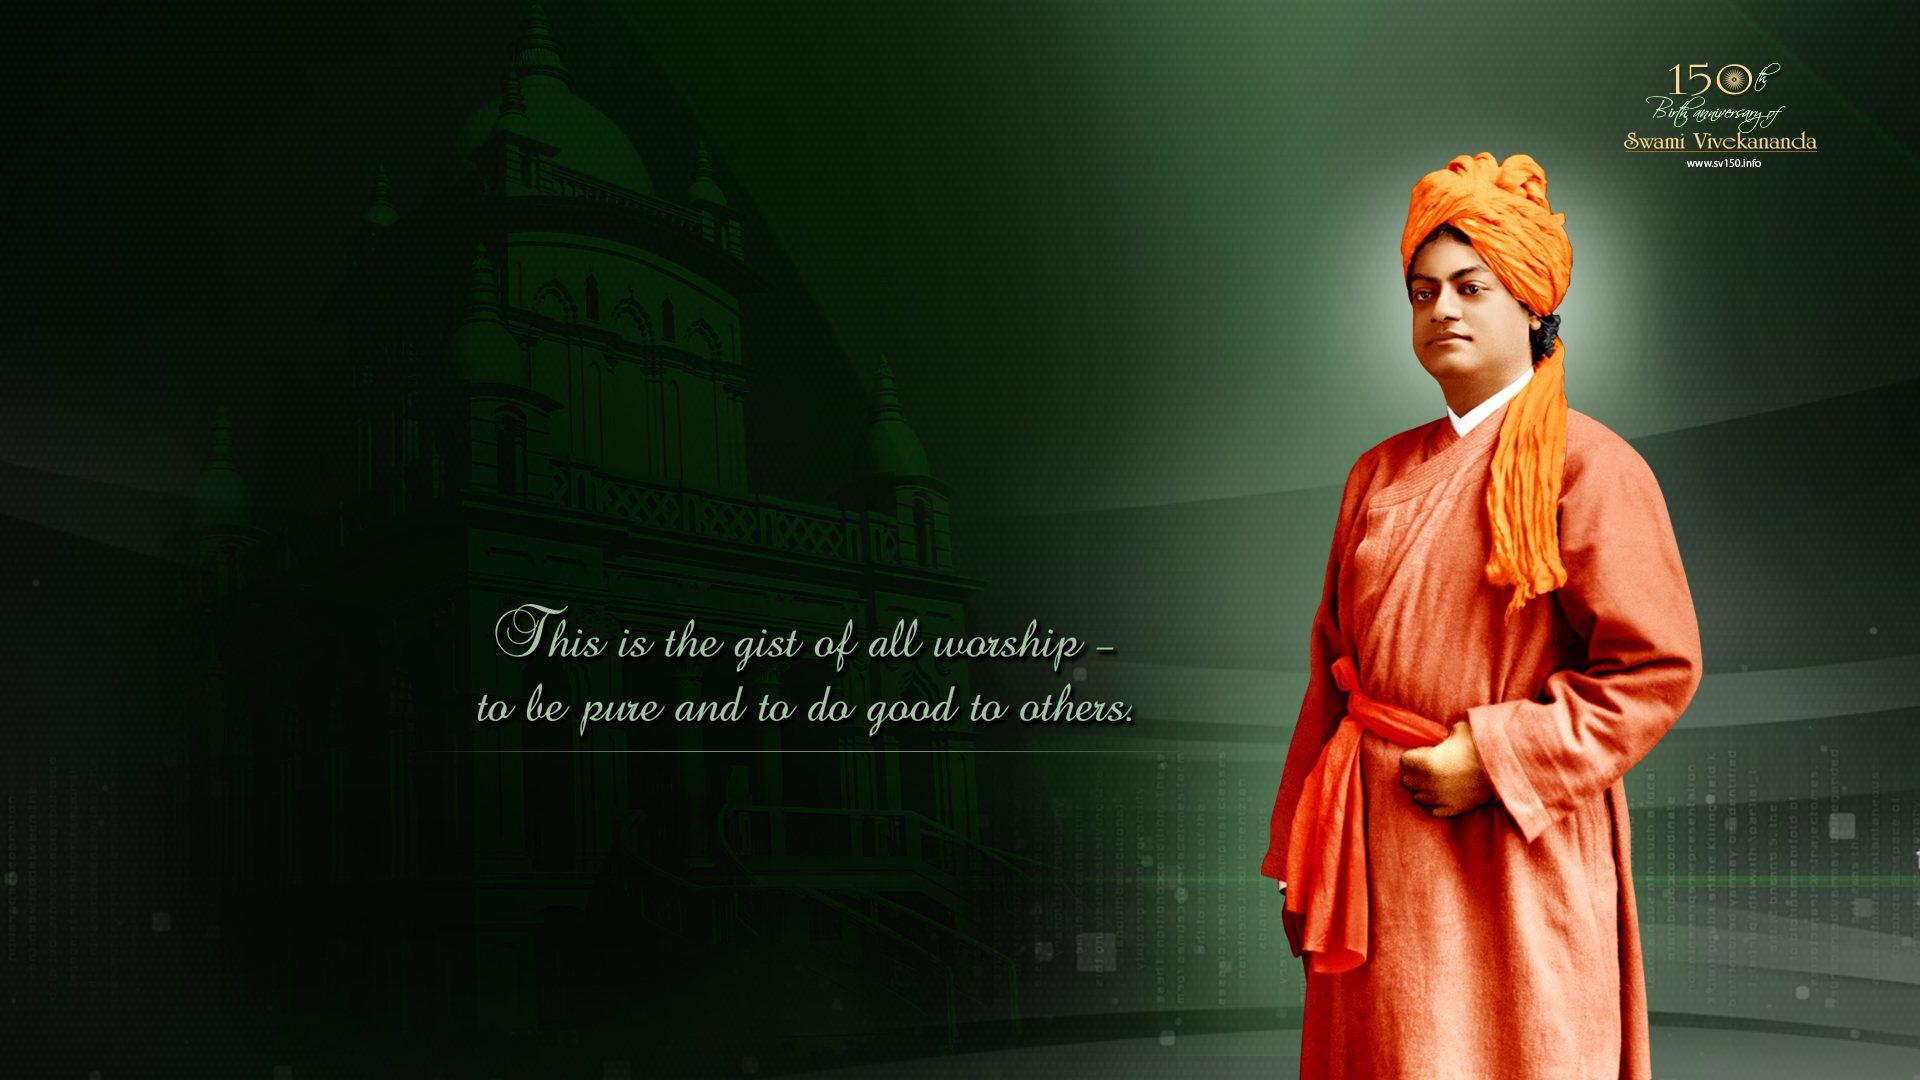 Swami Vivekananda Quotes Wallpapers Quotesgram